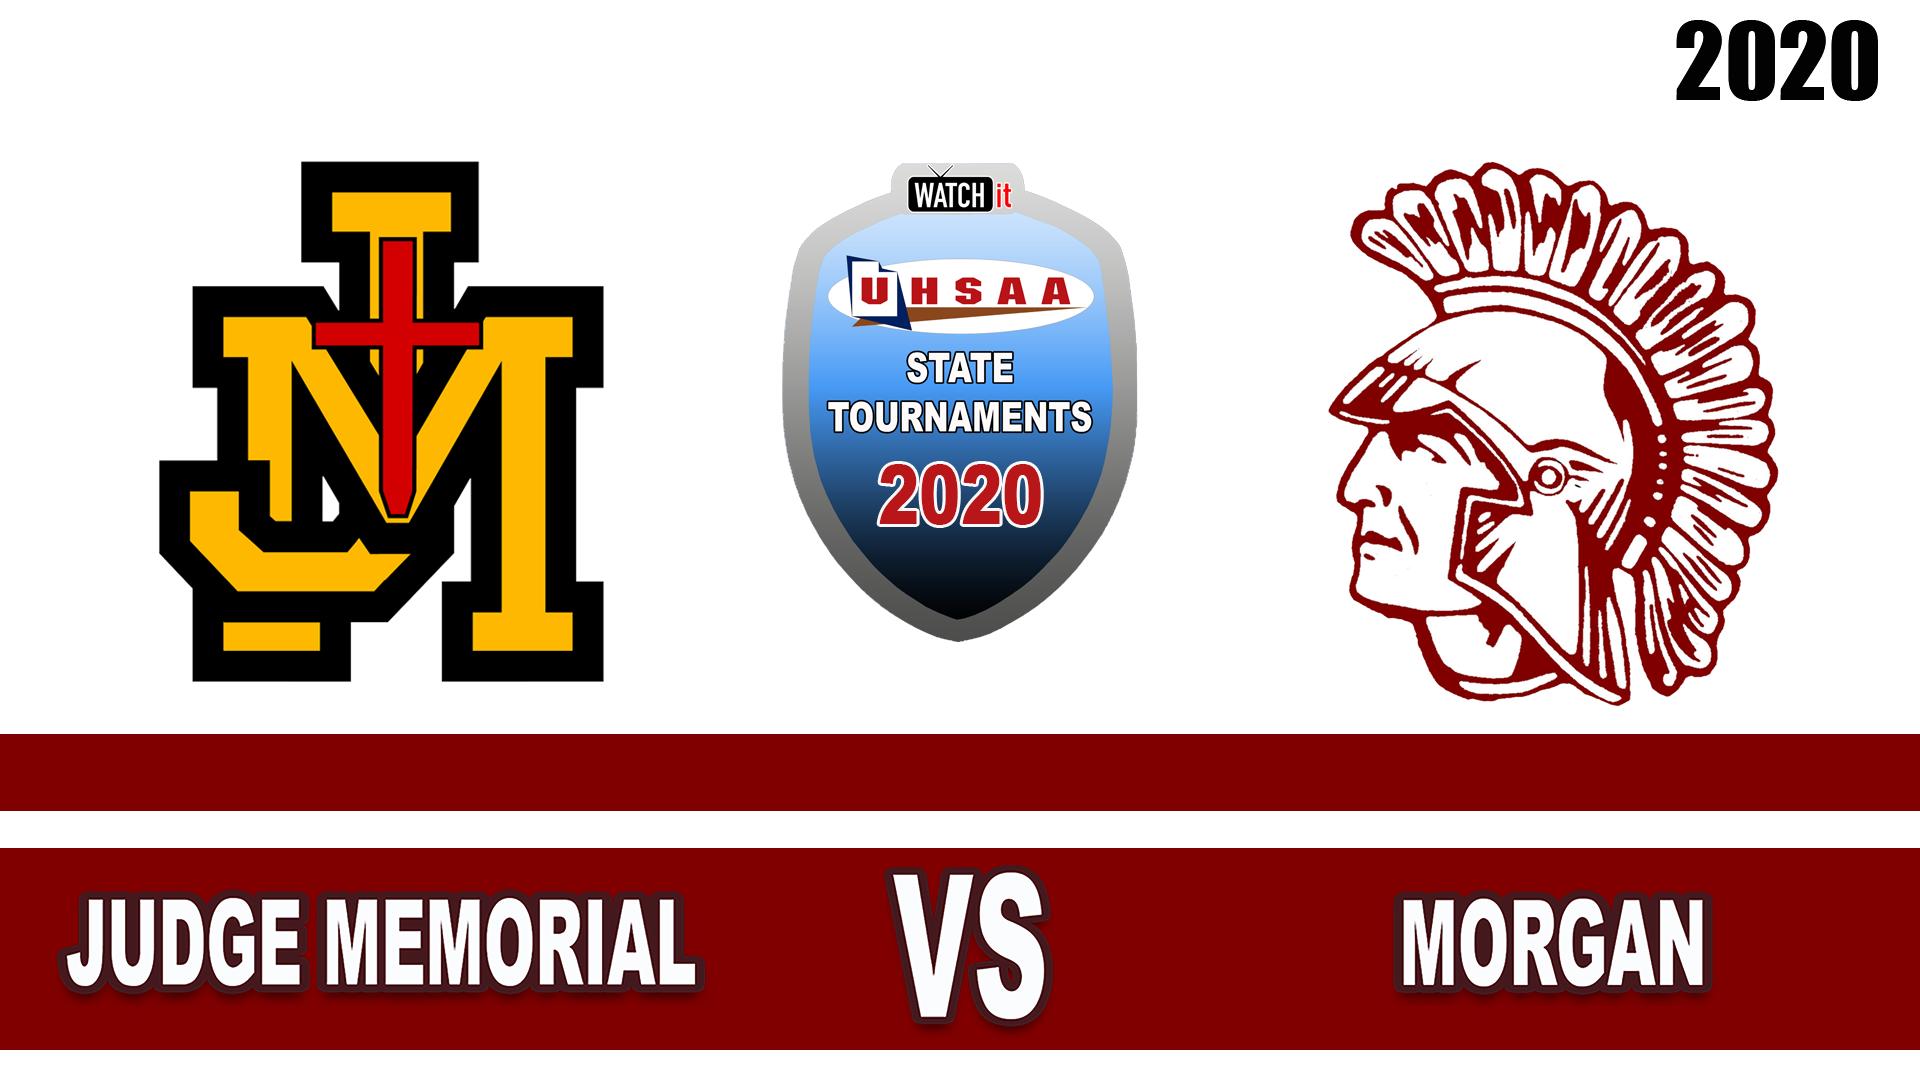 Judge Memorial vs Morgan